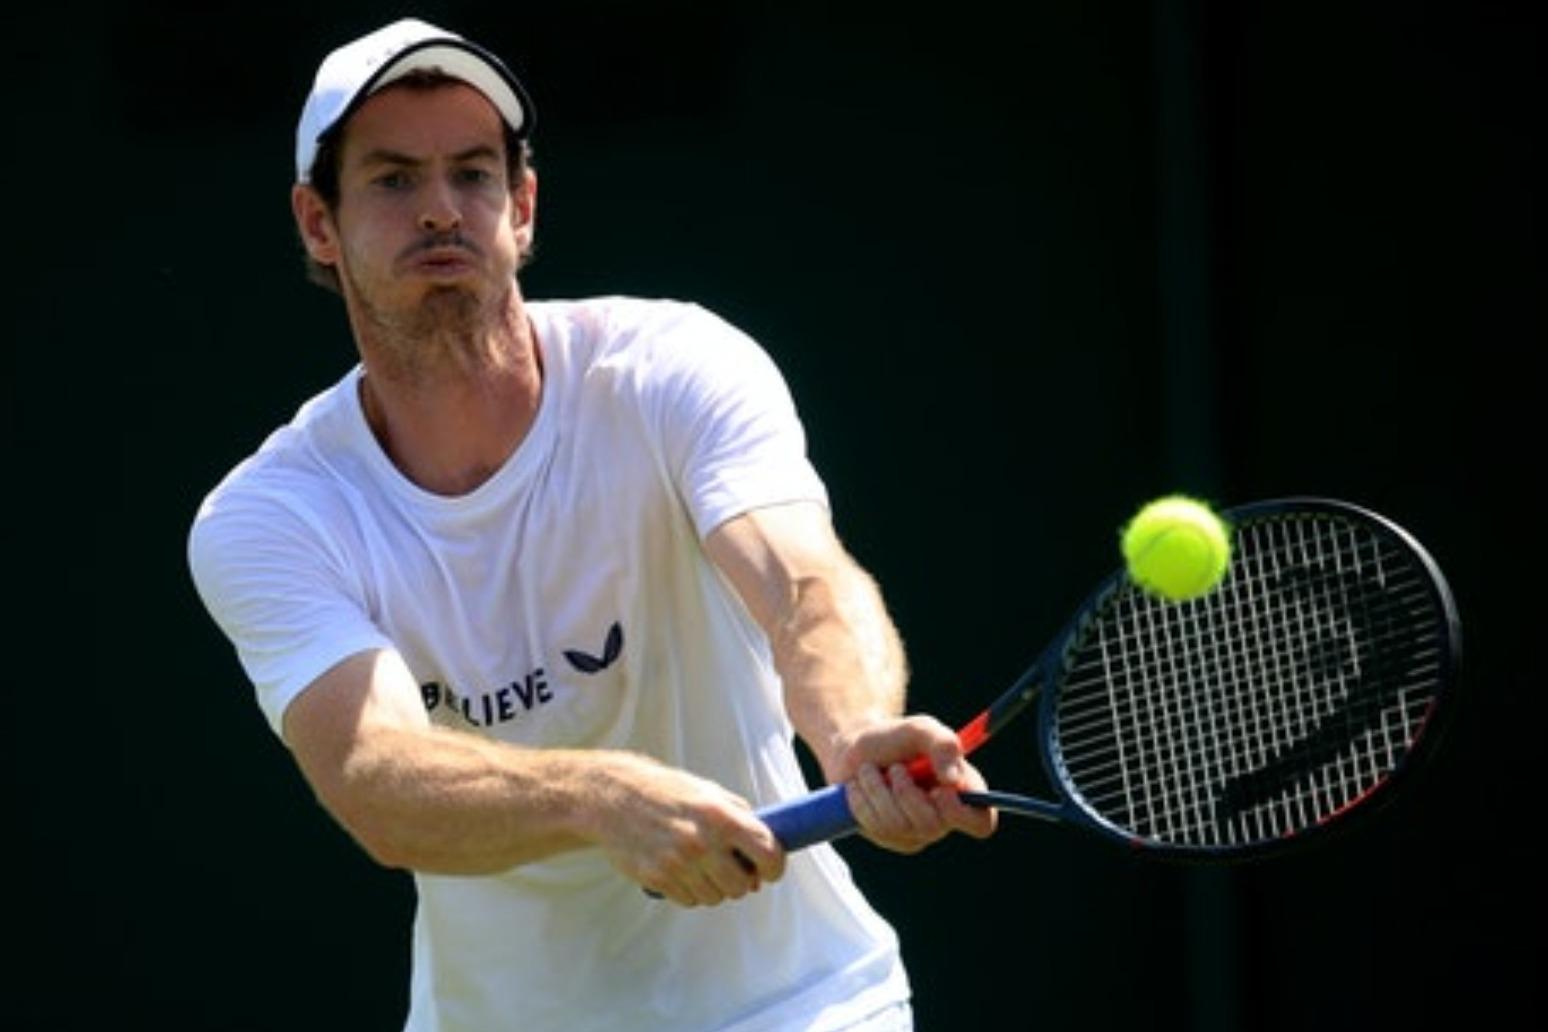 Coronavirus vaccines should be compulsory for tennis players – Andy Murray